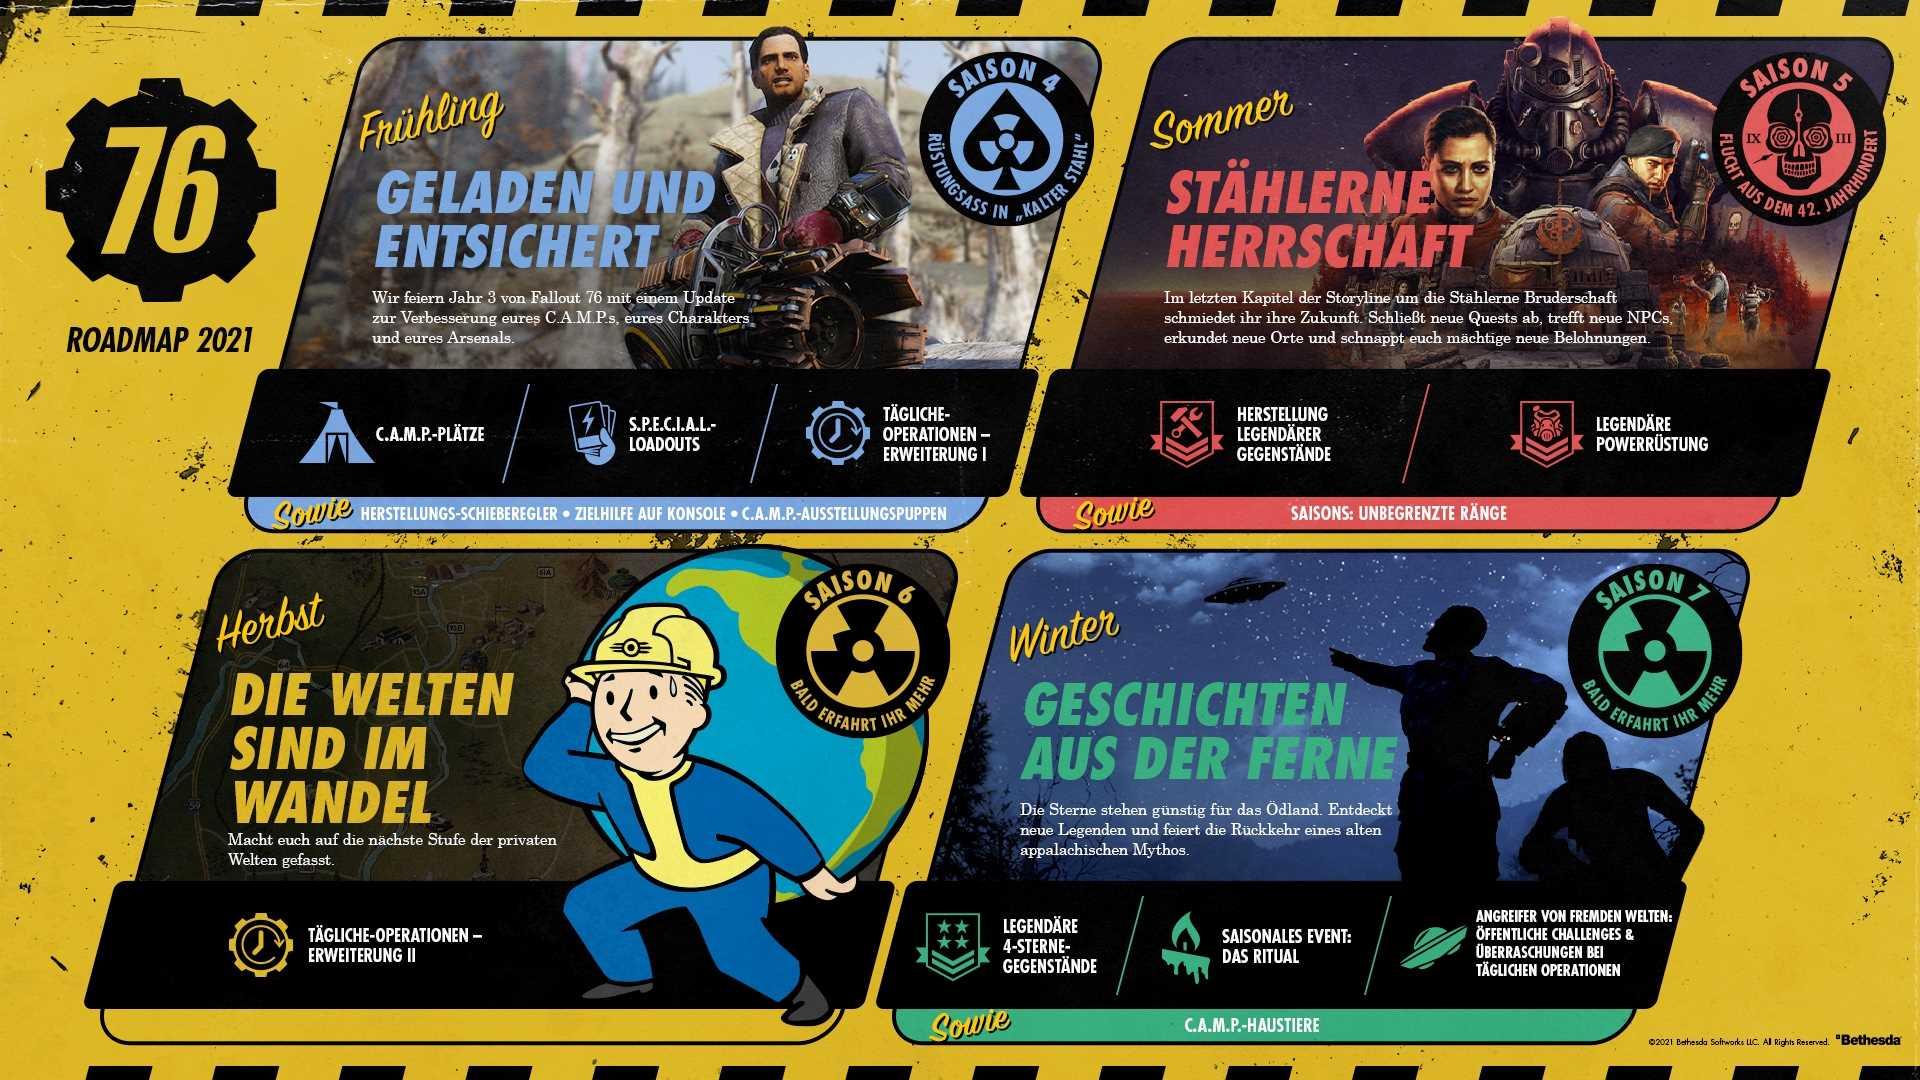 Fallout 76 Roadmap 2021 - Roadmap